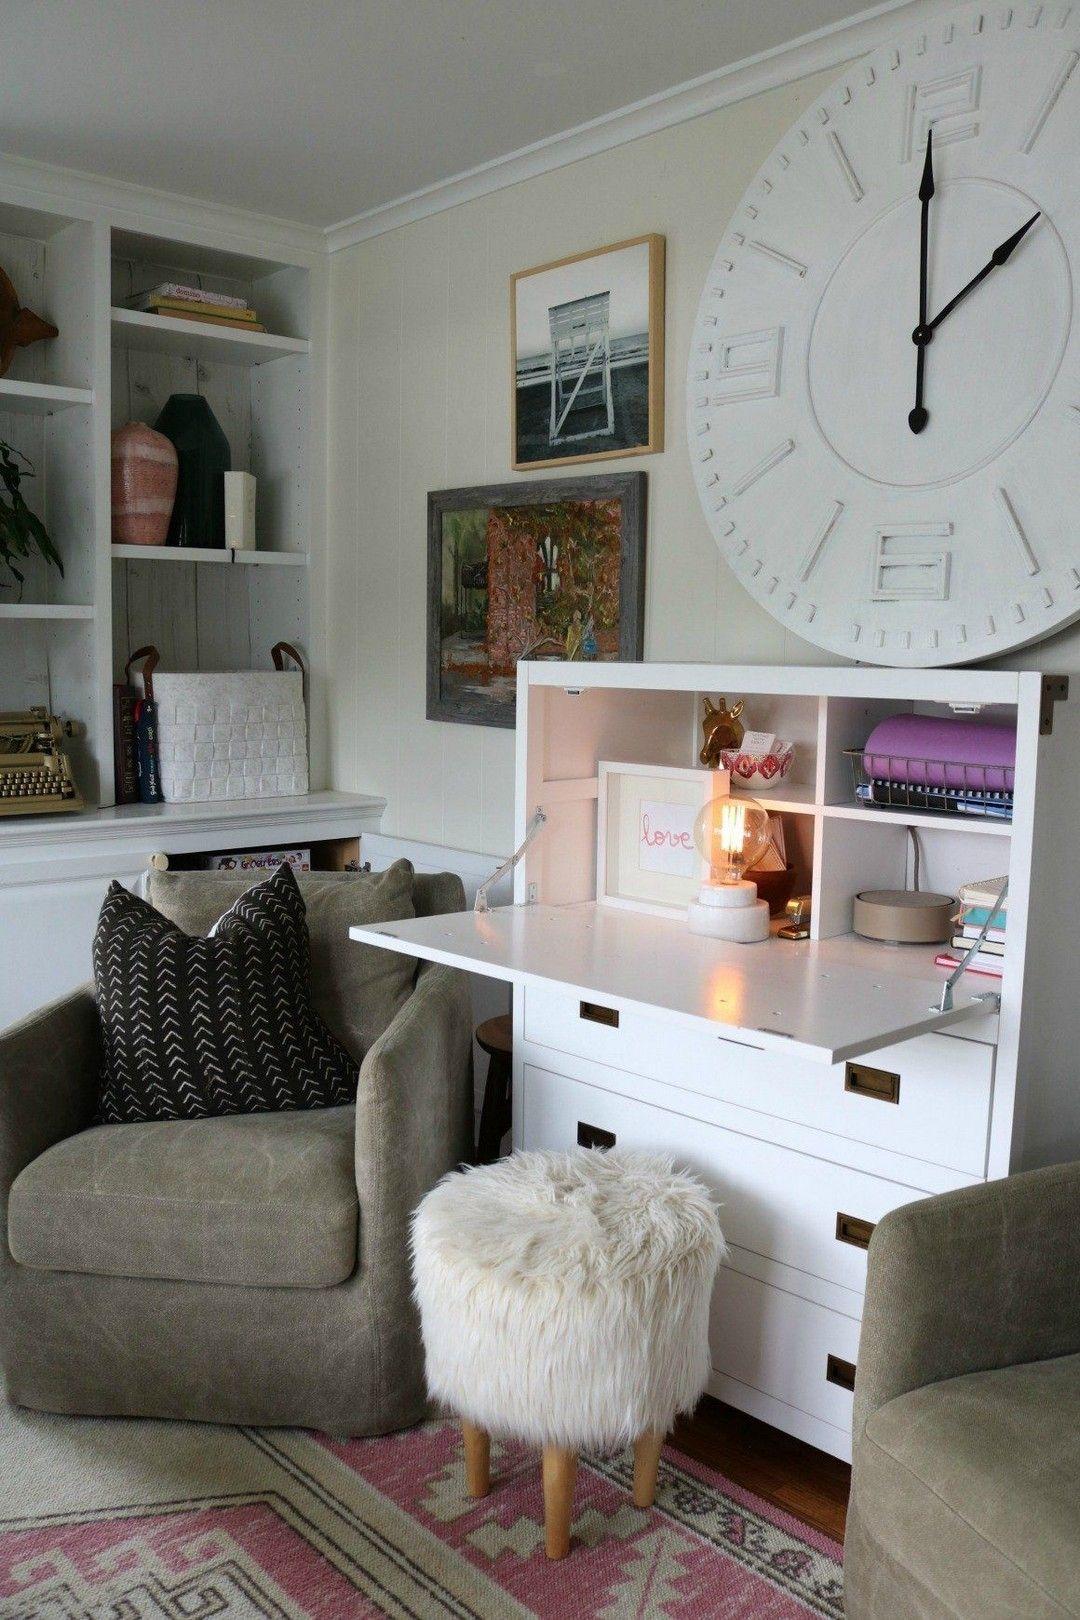 26 Diy Small Space Hidden Storage And Organization Ideas S